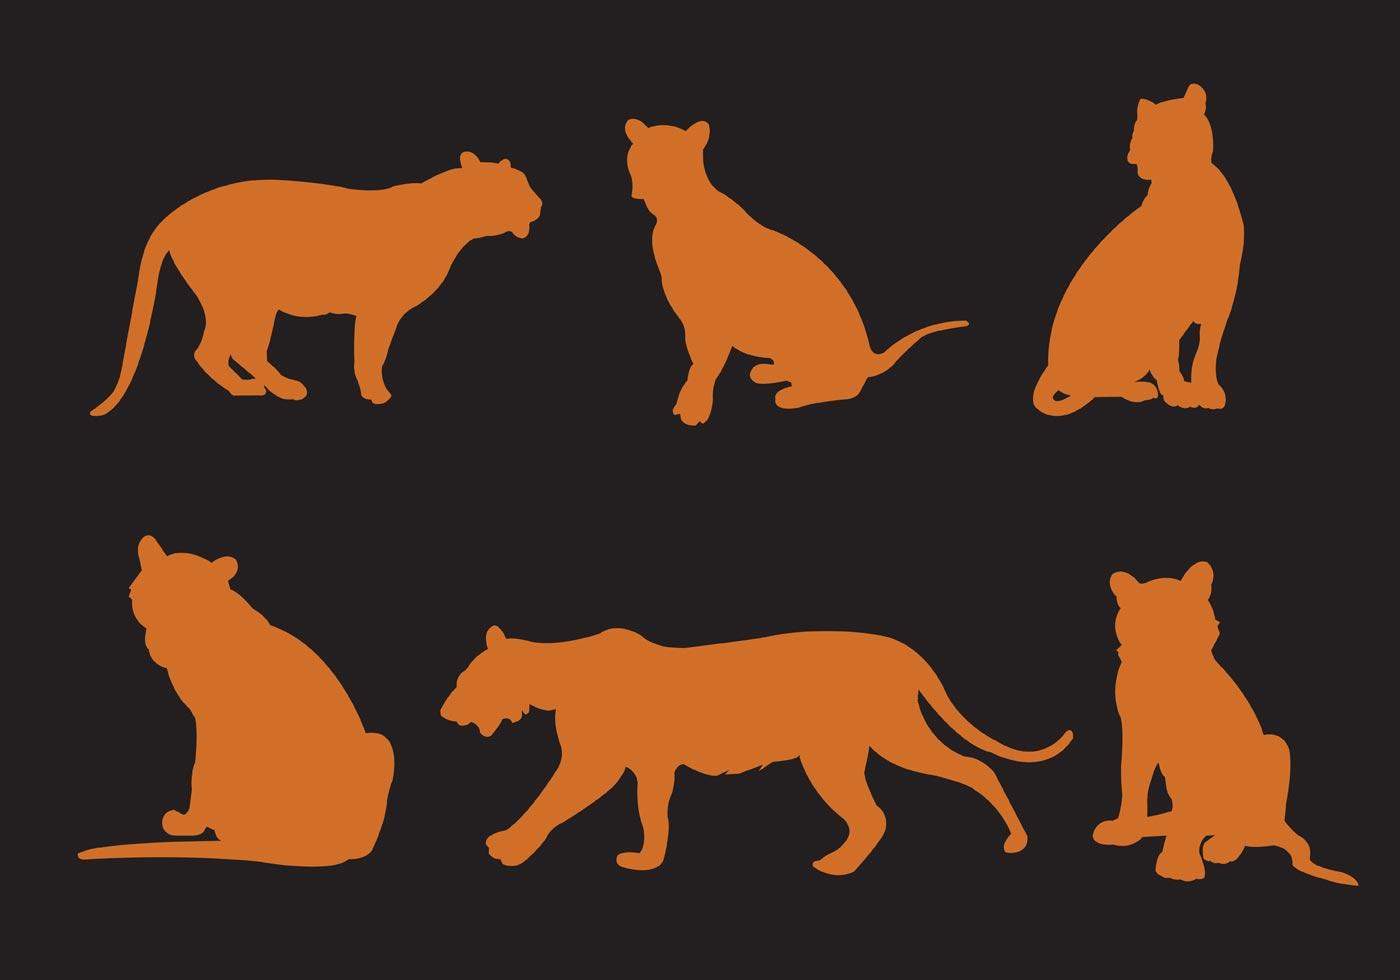 Animal Print Desktop Wallpaper Vector Silhouette Of Tigers Download Free Vector Art